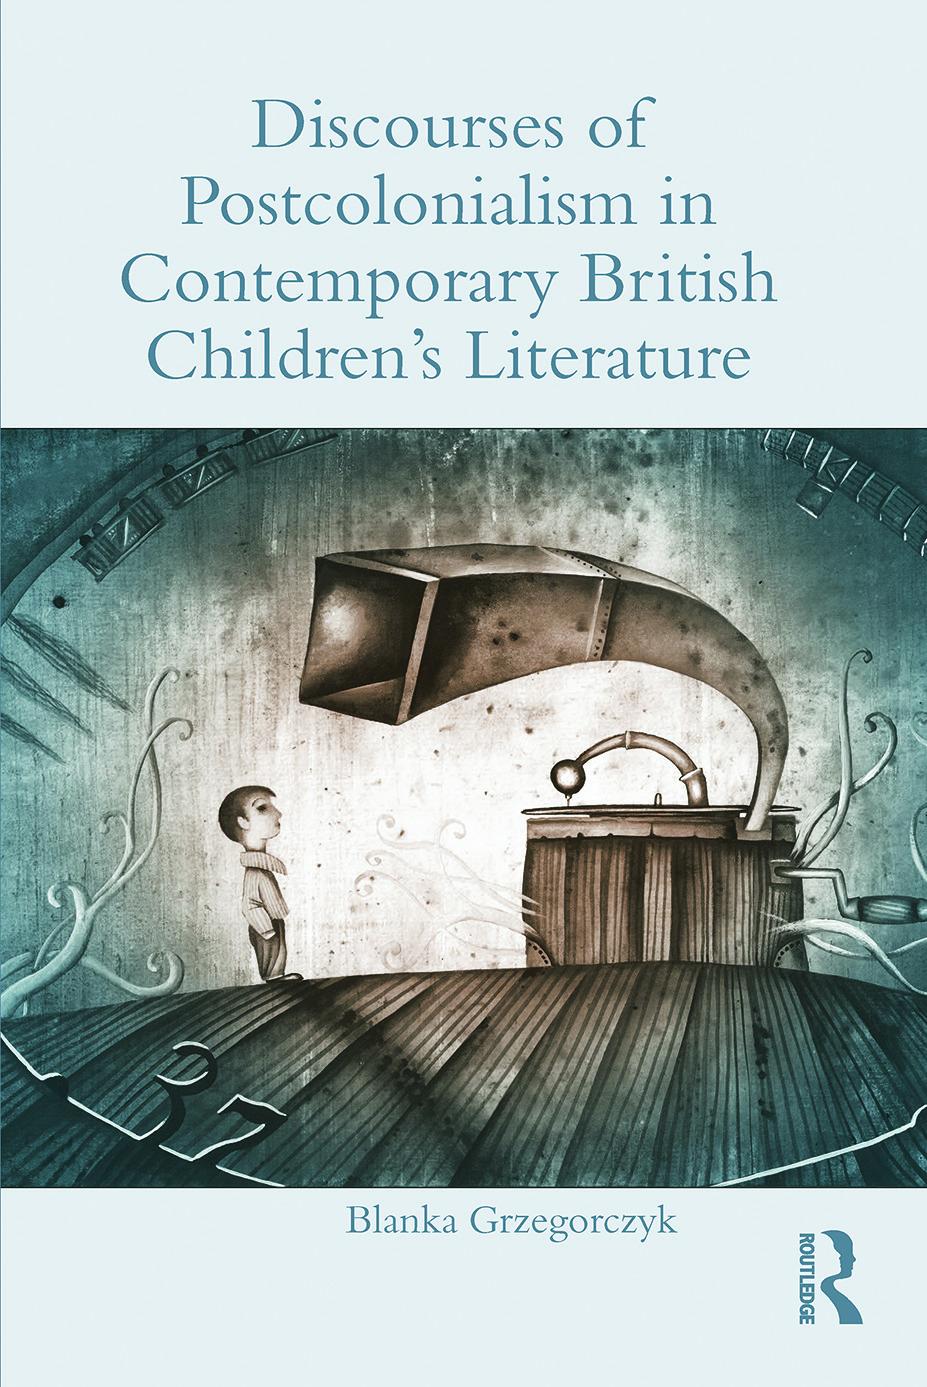 Discourses of Postcolonialism in Contemporary British Children's Literature book cover